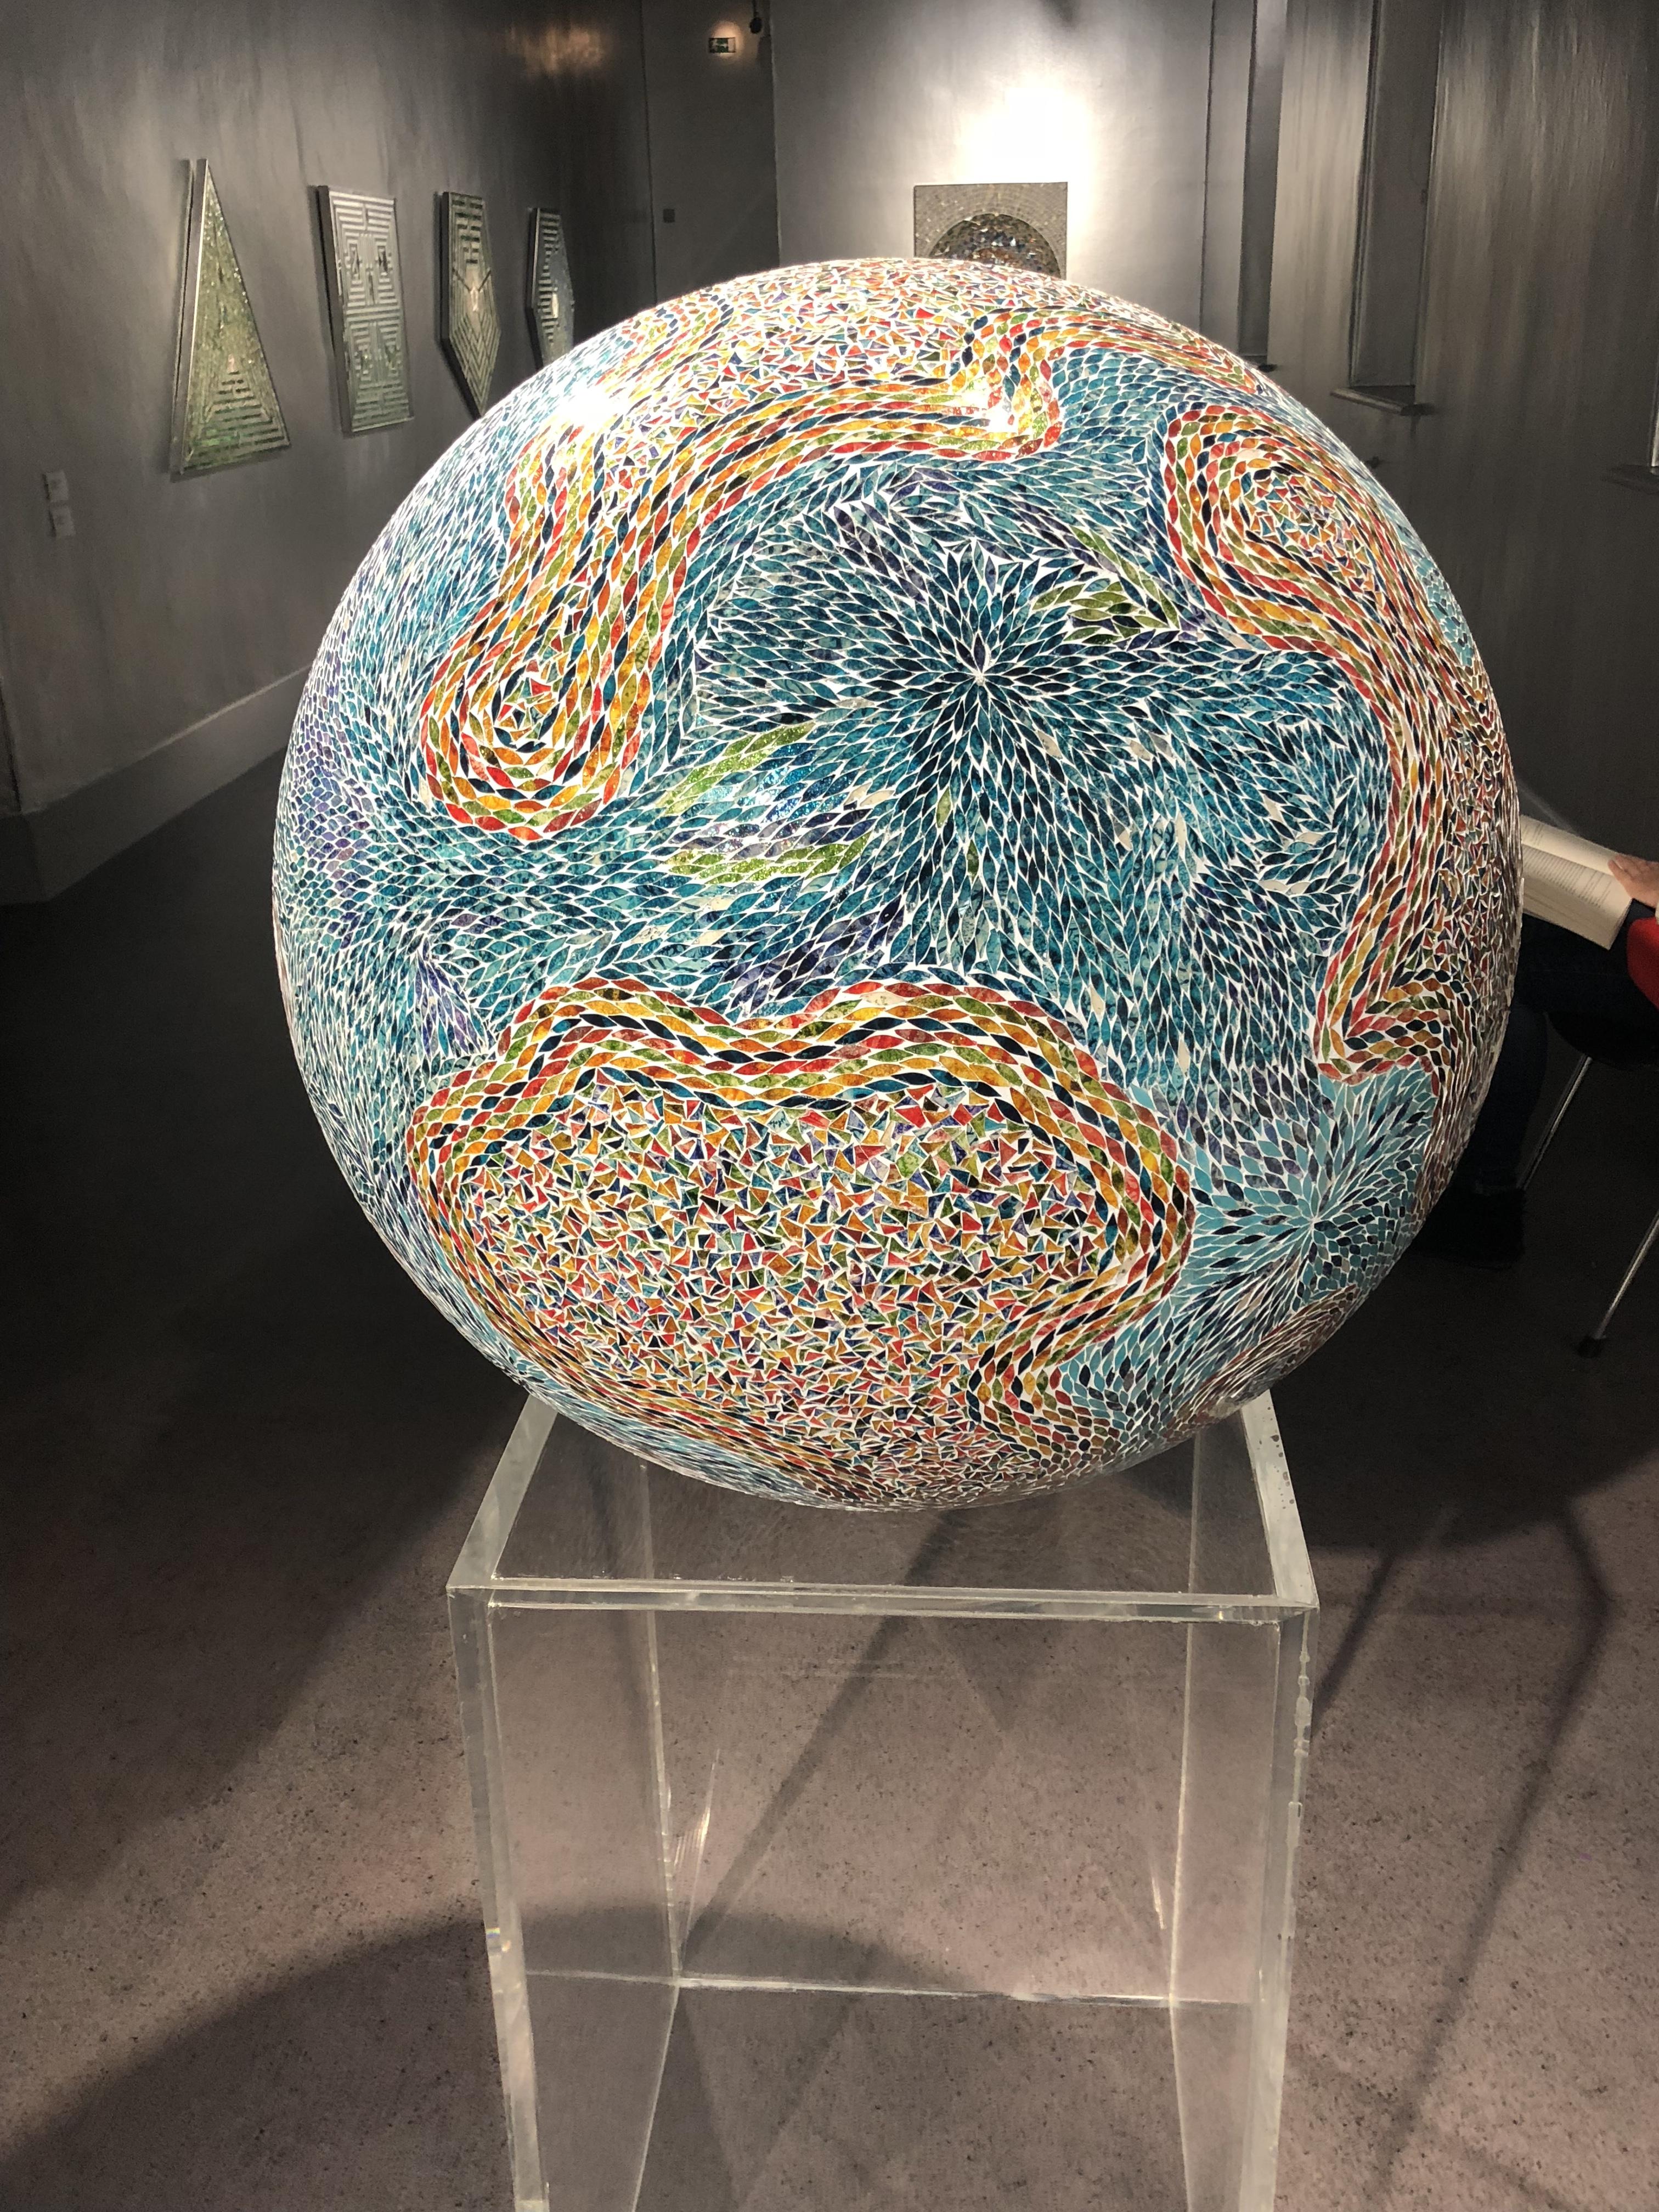 Collective Weave – Museu de Arte Moderna da Irlanda